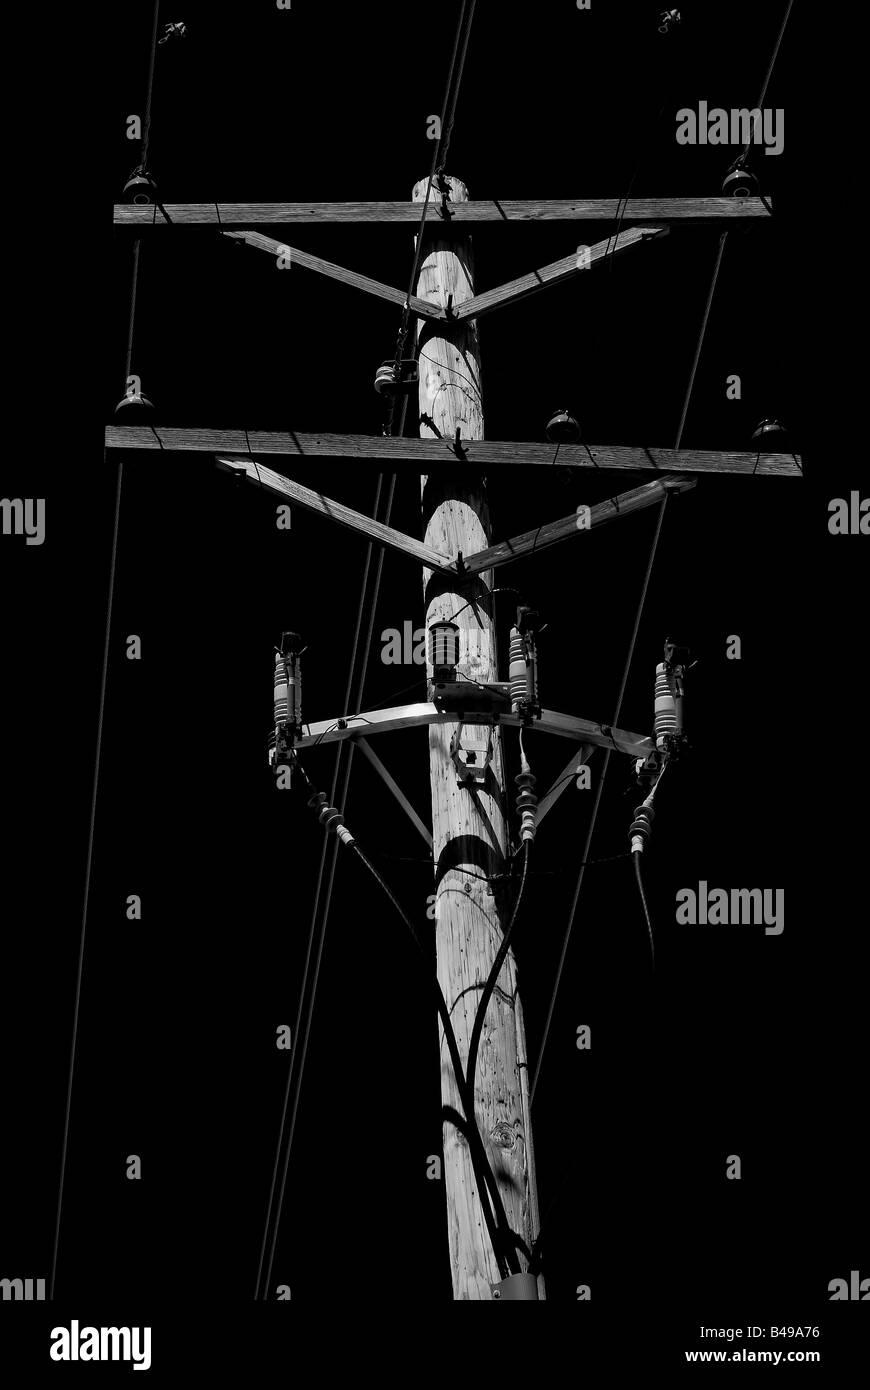 A Telephone Pole against a black sky - Stock Image